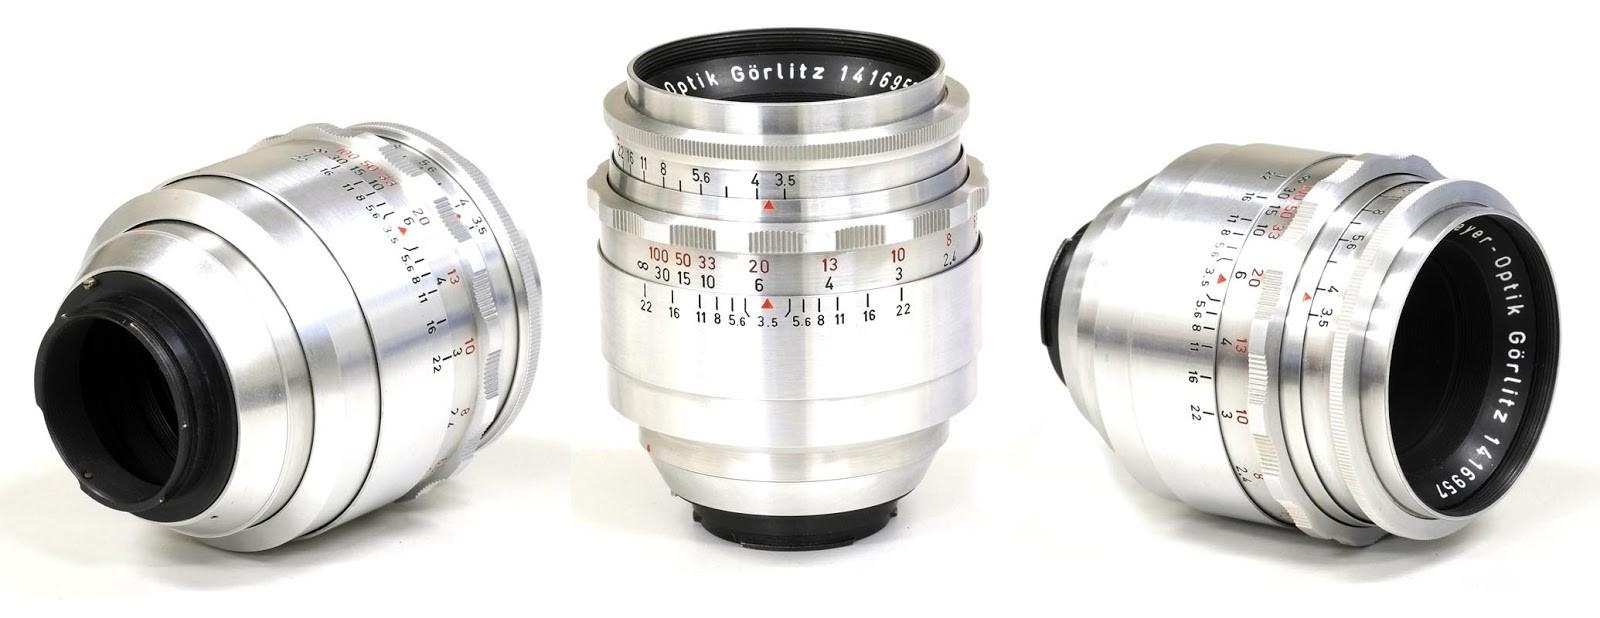 梅耶Meyer-Optik Gorlitz PRIMOTAR 80mm F3.5(M42/EXAKTA/P6)镜头测试及样片